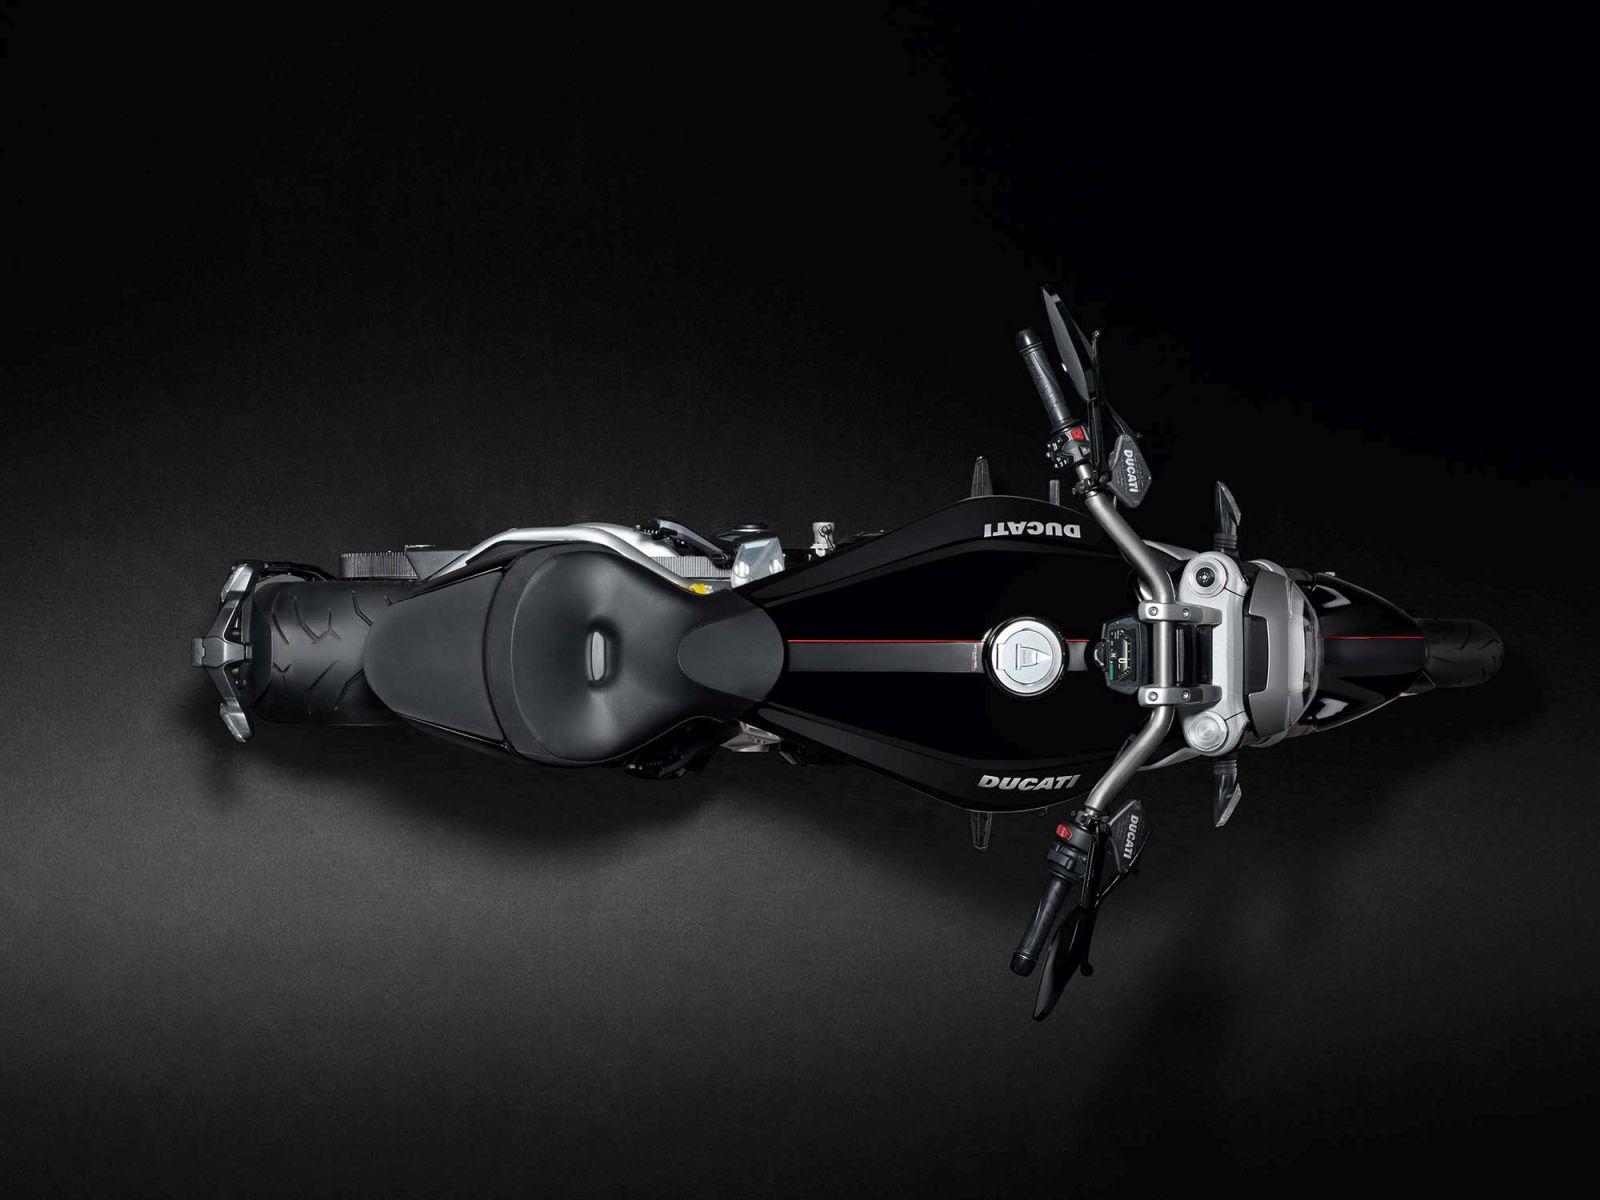 2016 Ducati XDiavel (13)